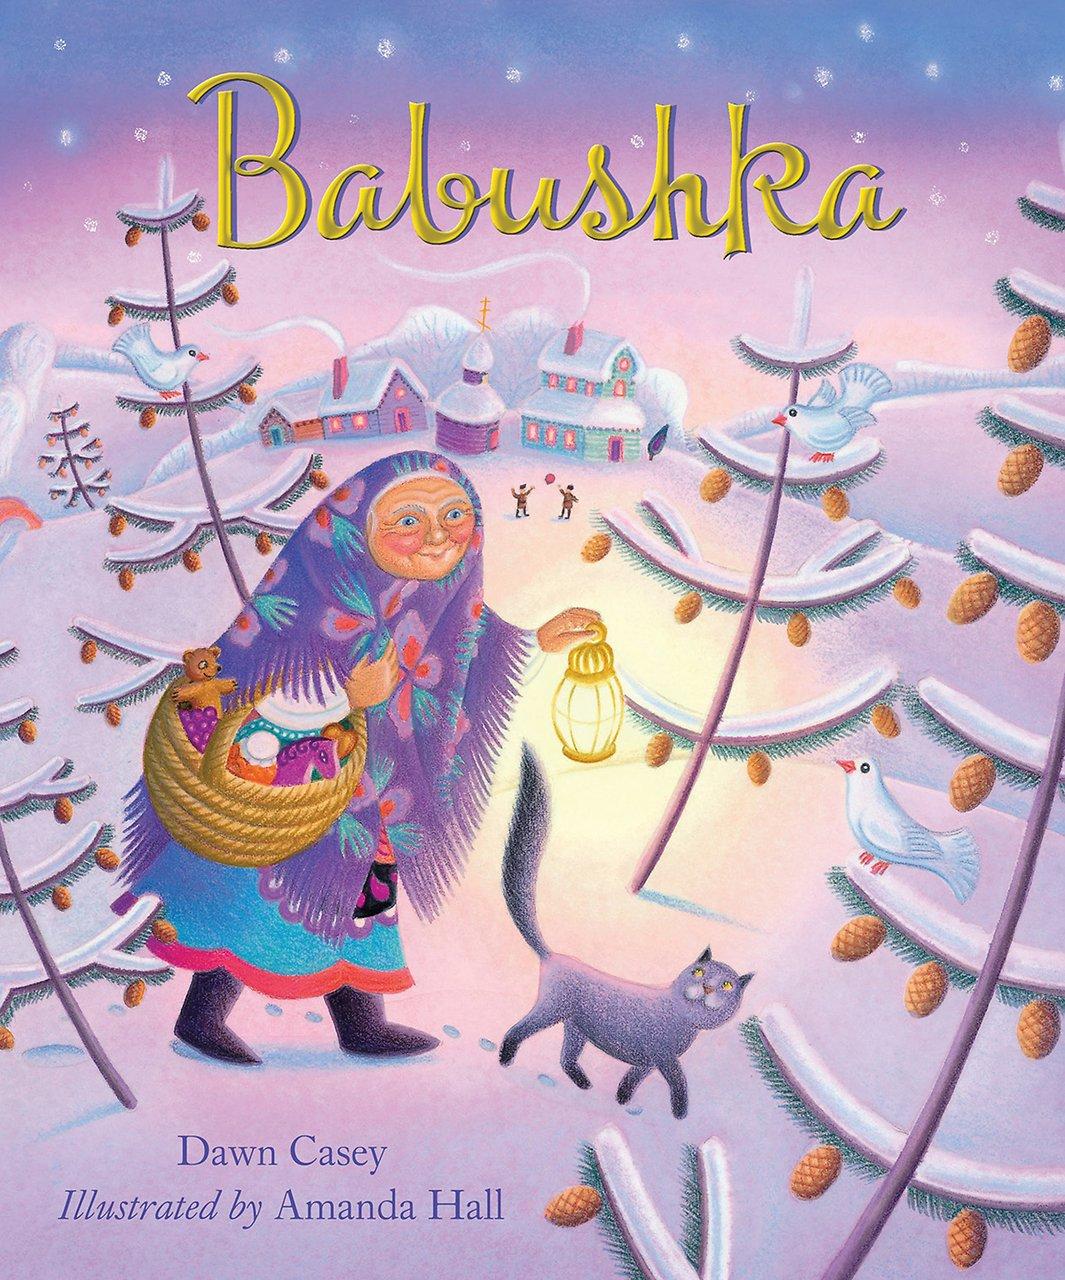 1052 Babushka A Christmas Tale By Dawn Casey And